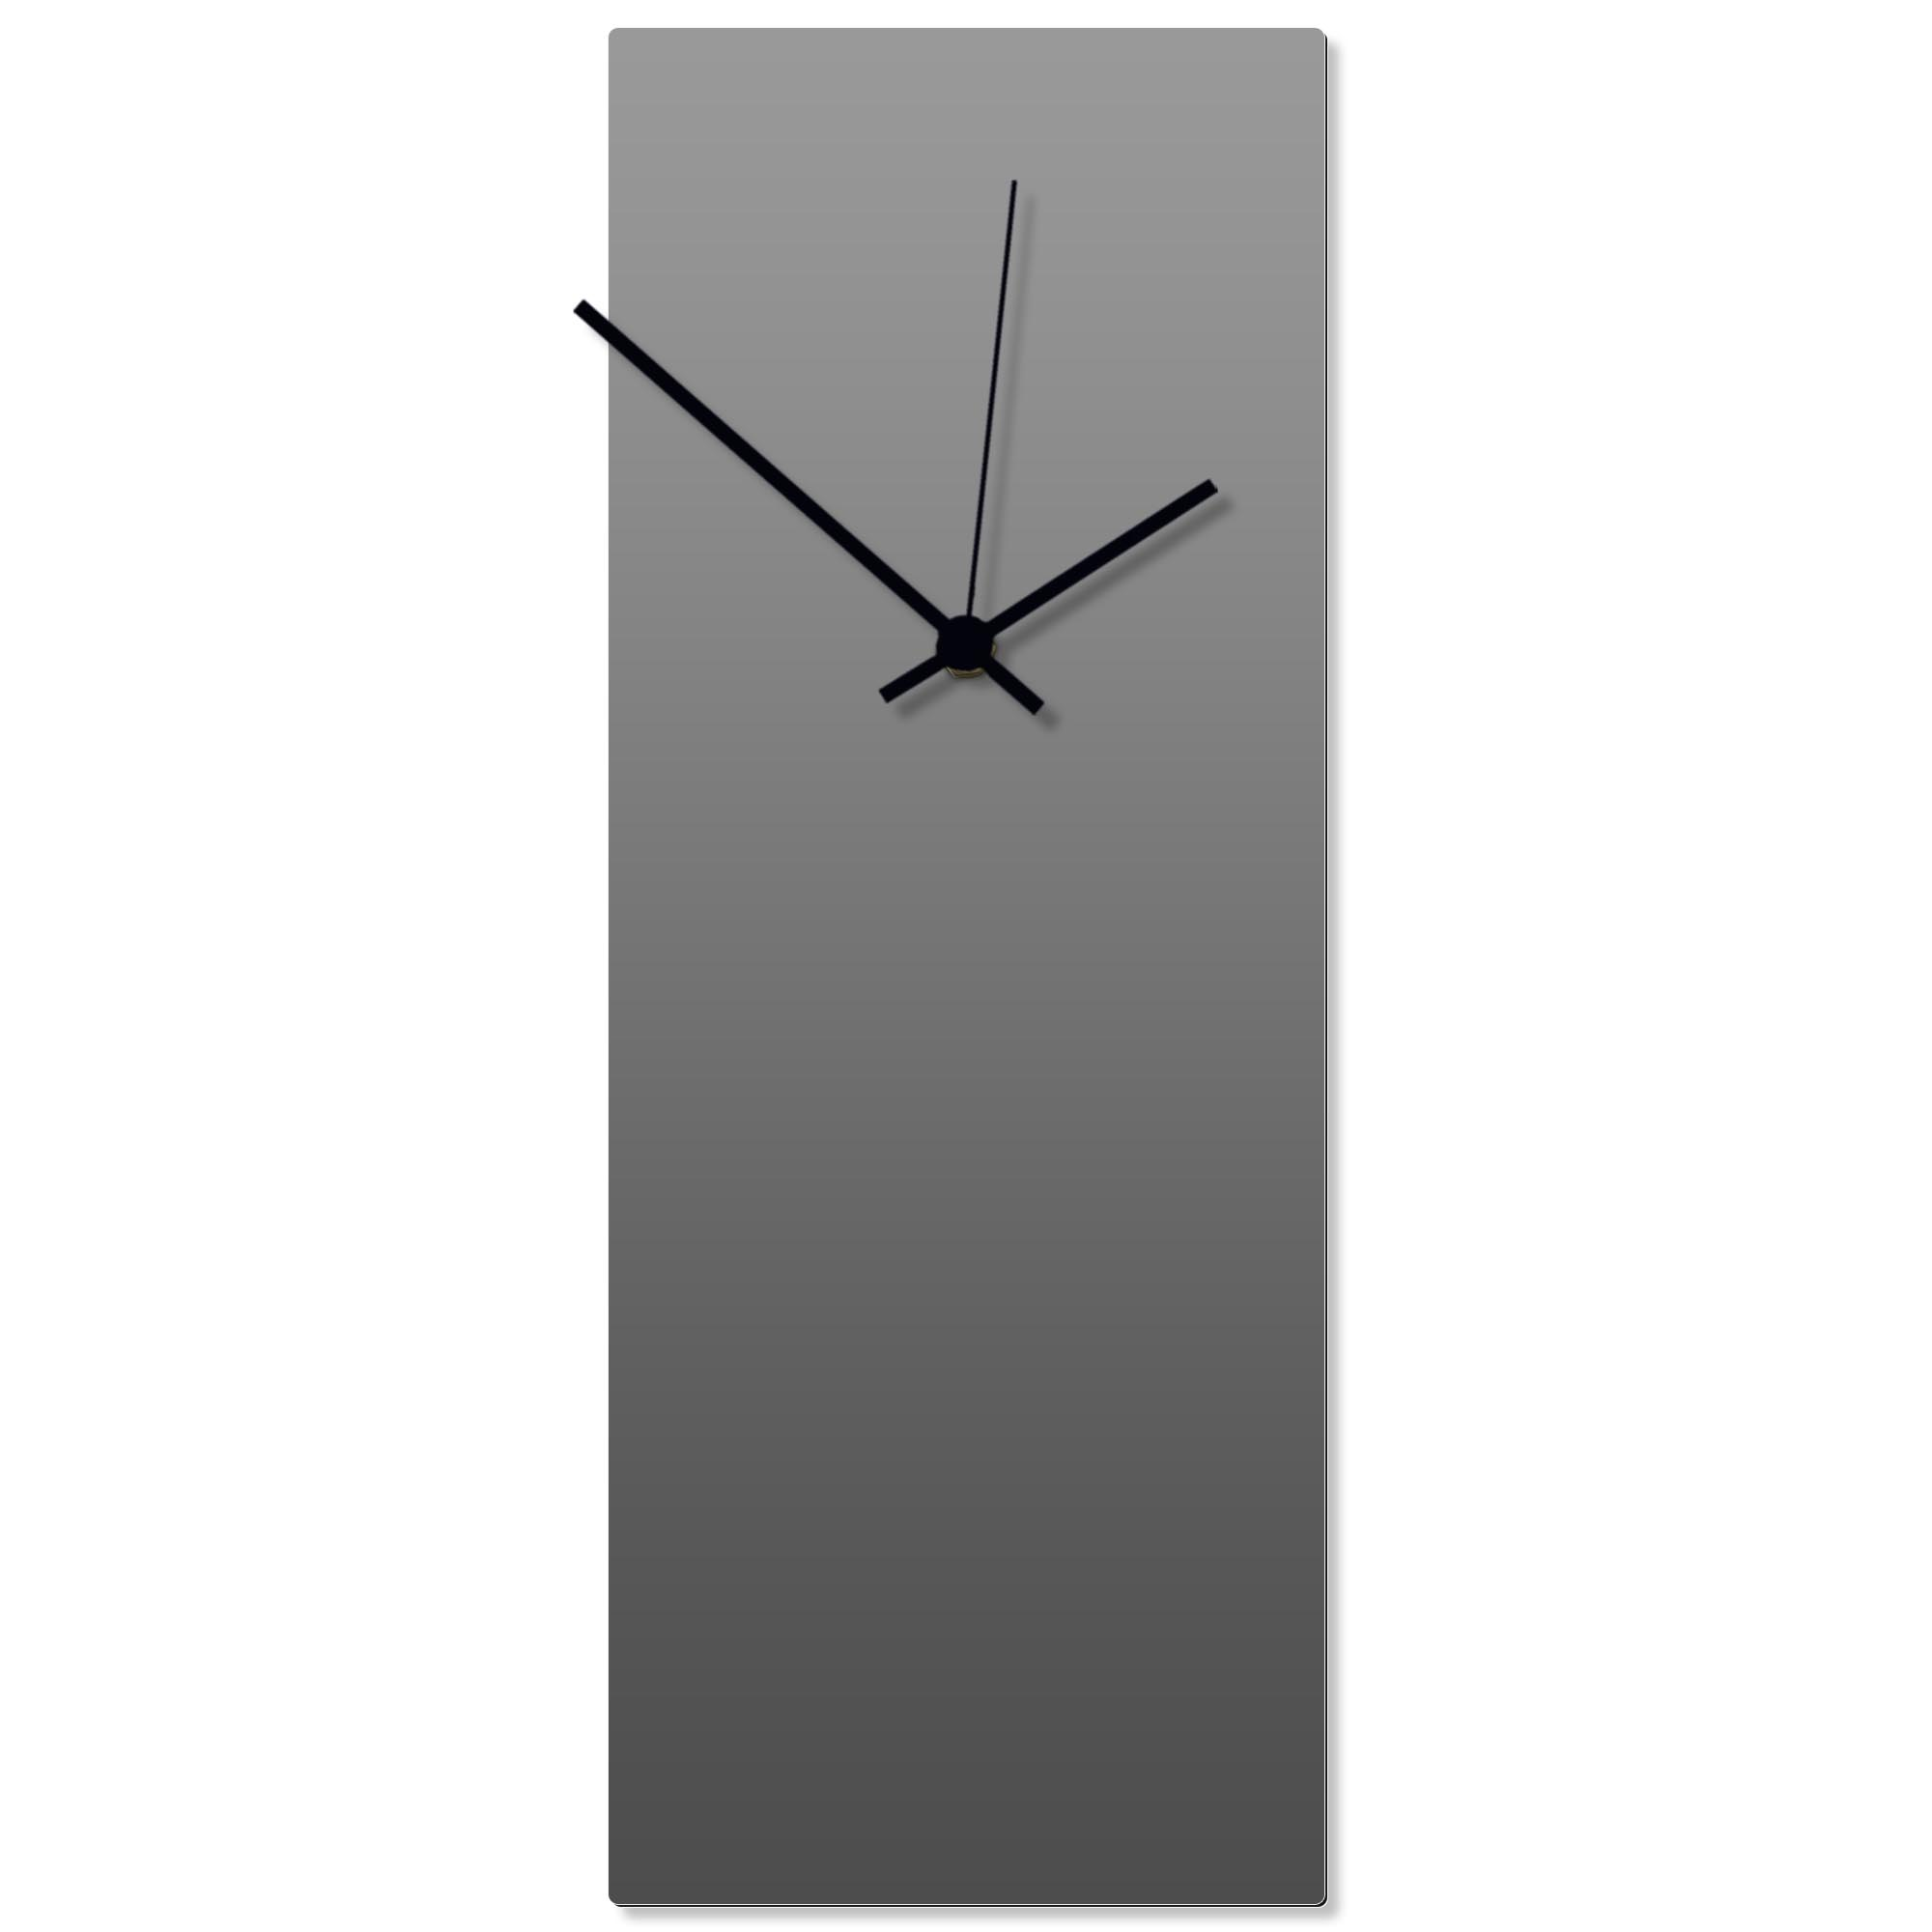 Grayout Black Clock Large 8.25x22in. Aluminum Polymetal